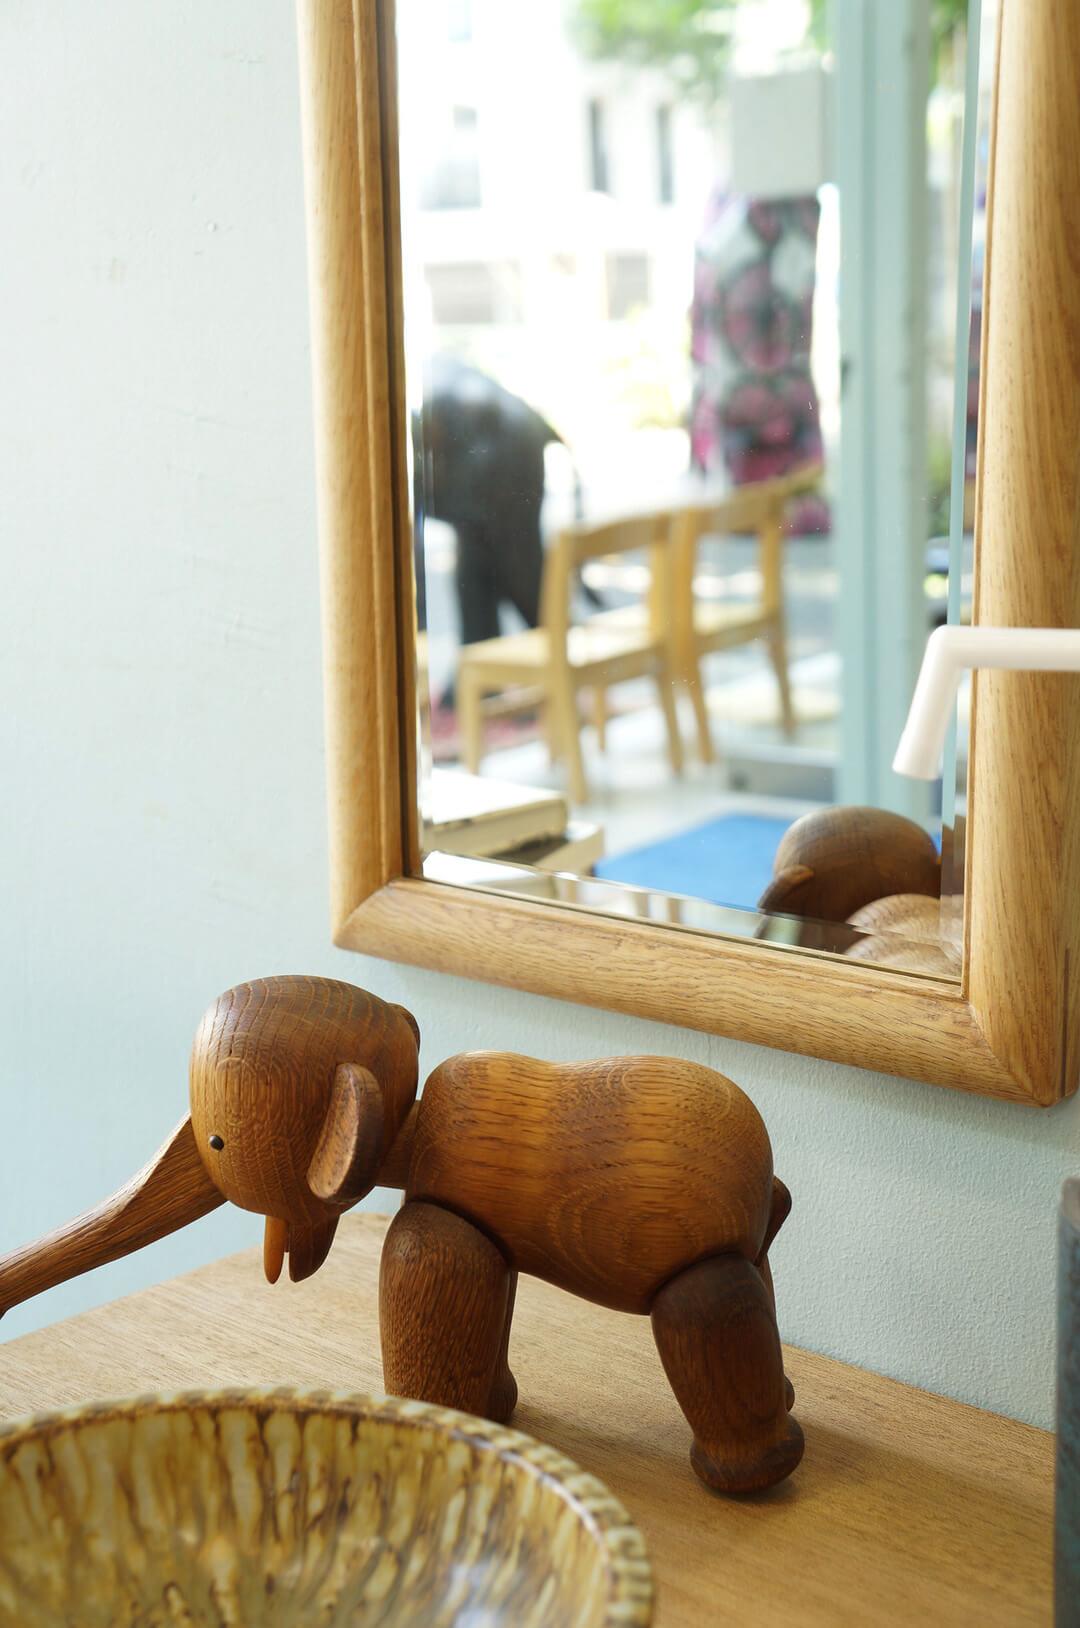 Oak Wood Wall Mirror/オーク材 ウォールミラー 壁掛け鏡 姿見 ナチュラル インテリア